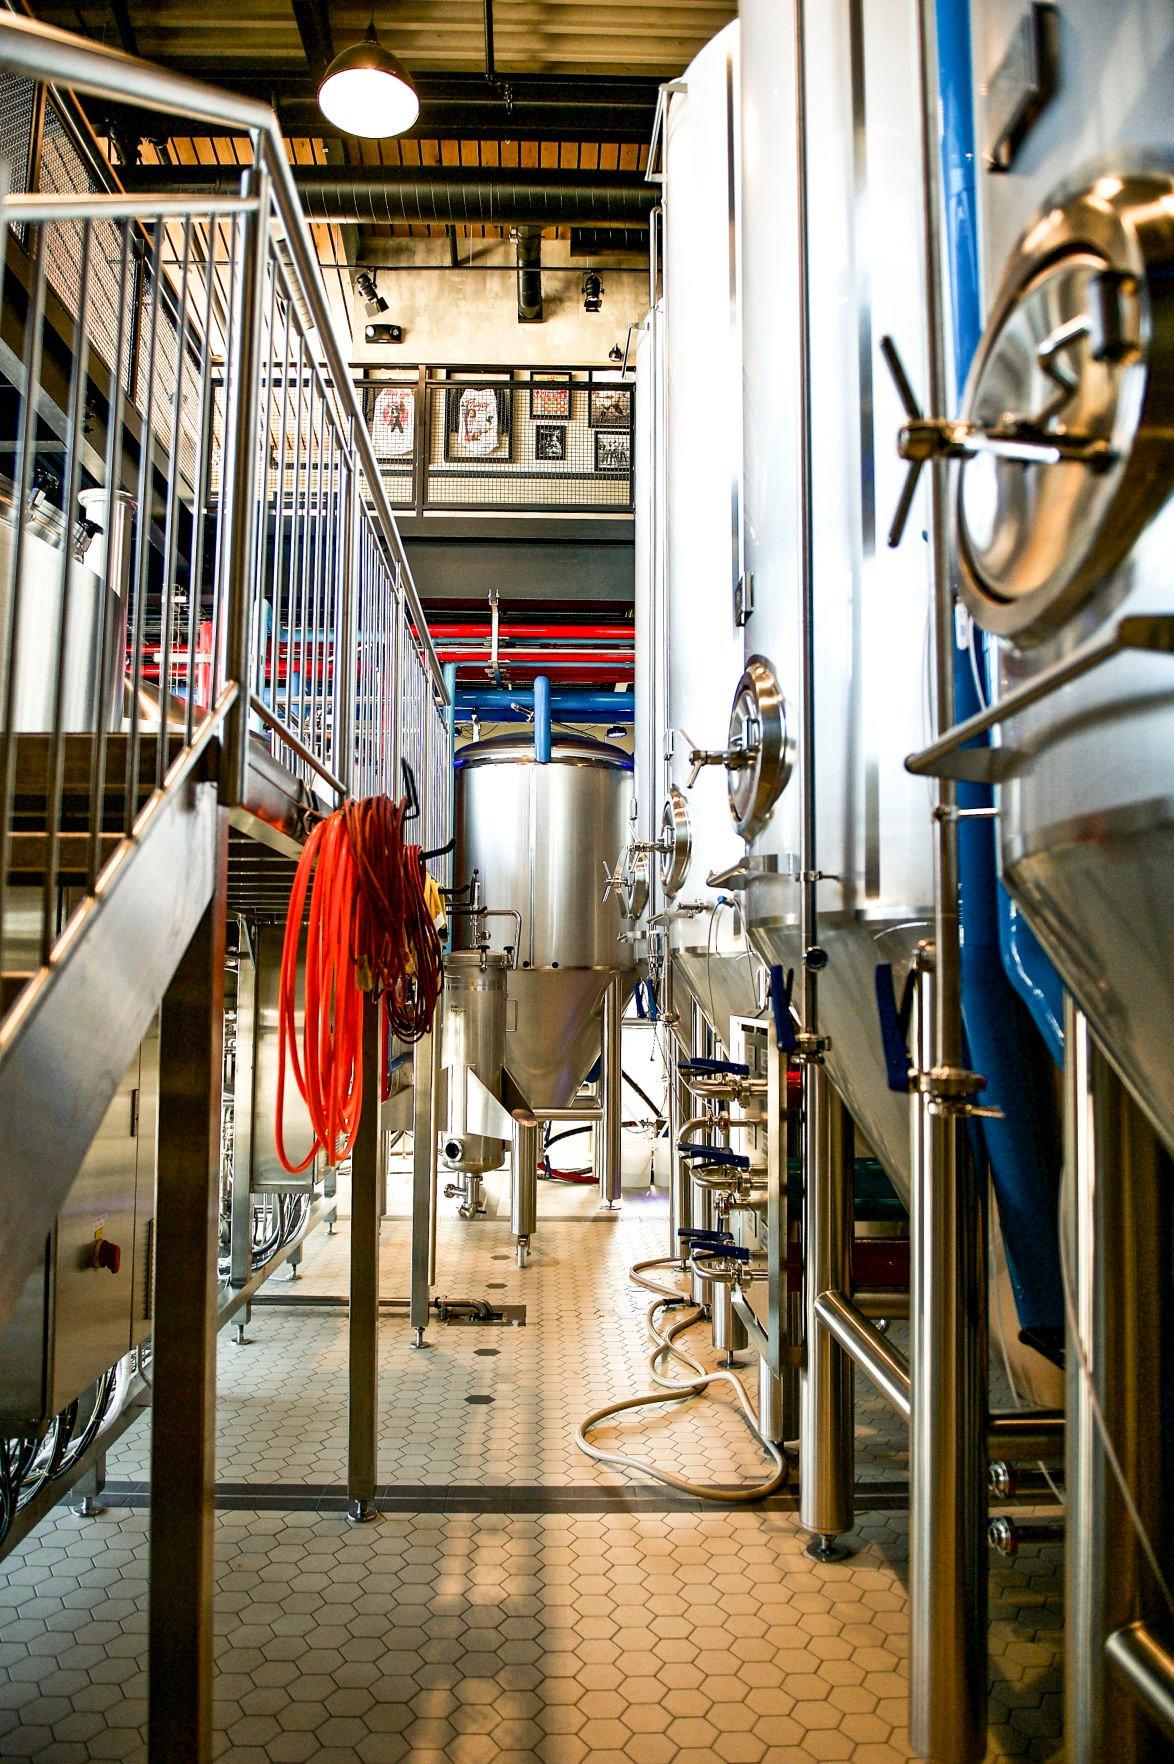 John Collins: Essex Great Marsh Brewer